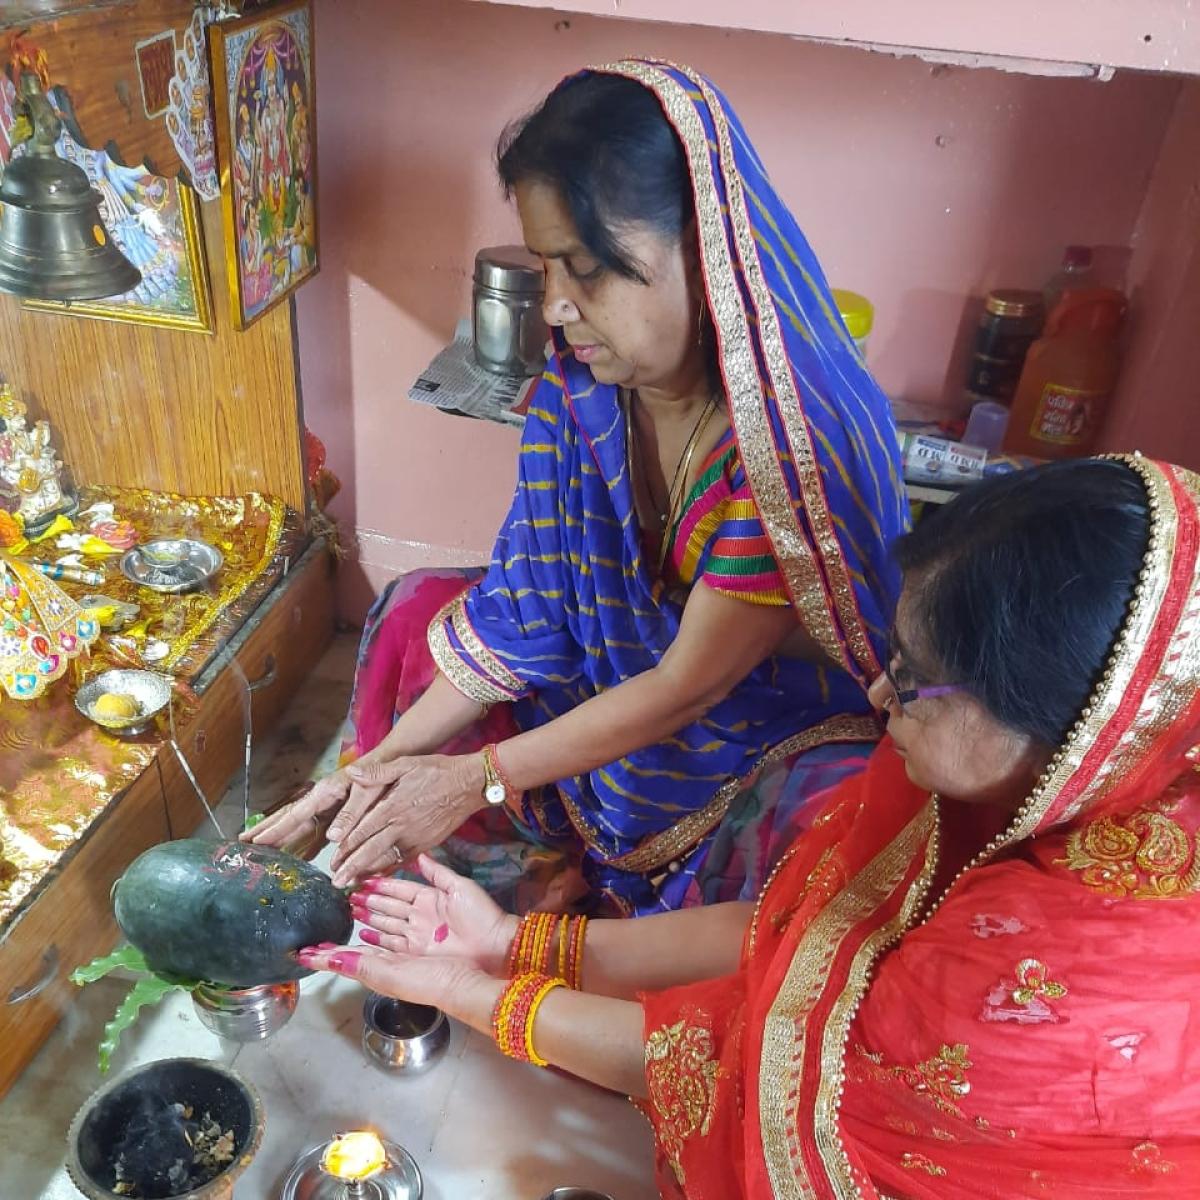 Akshaya Tritiya 2020: Day of prayers, new beginnings